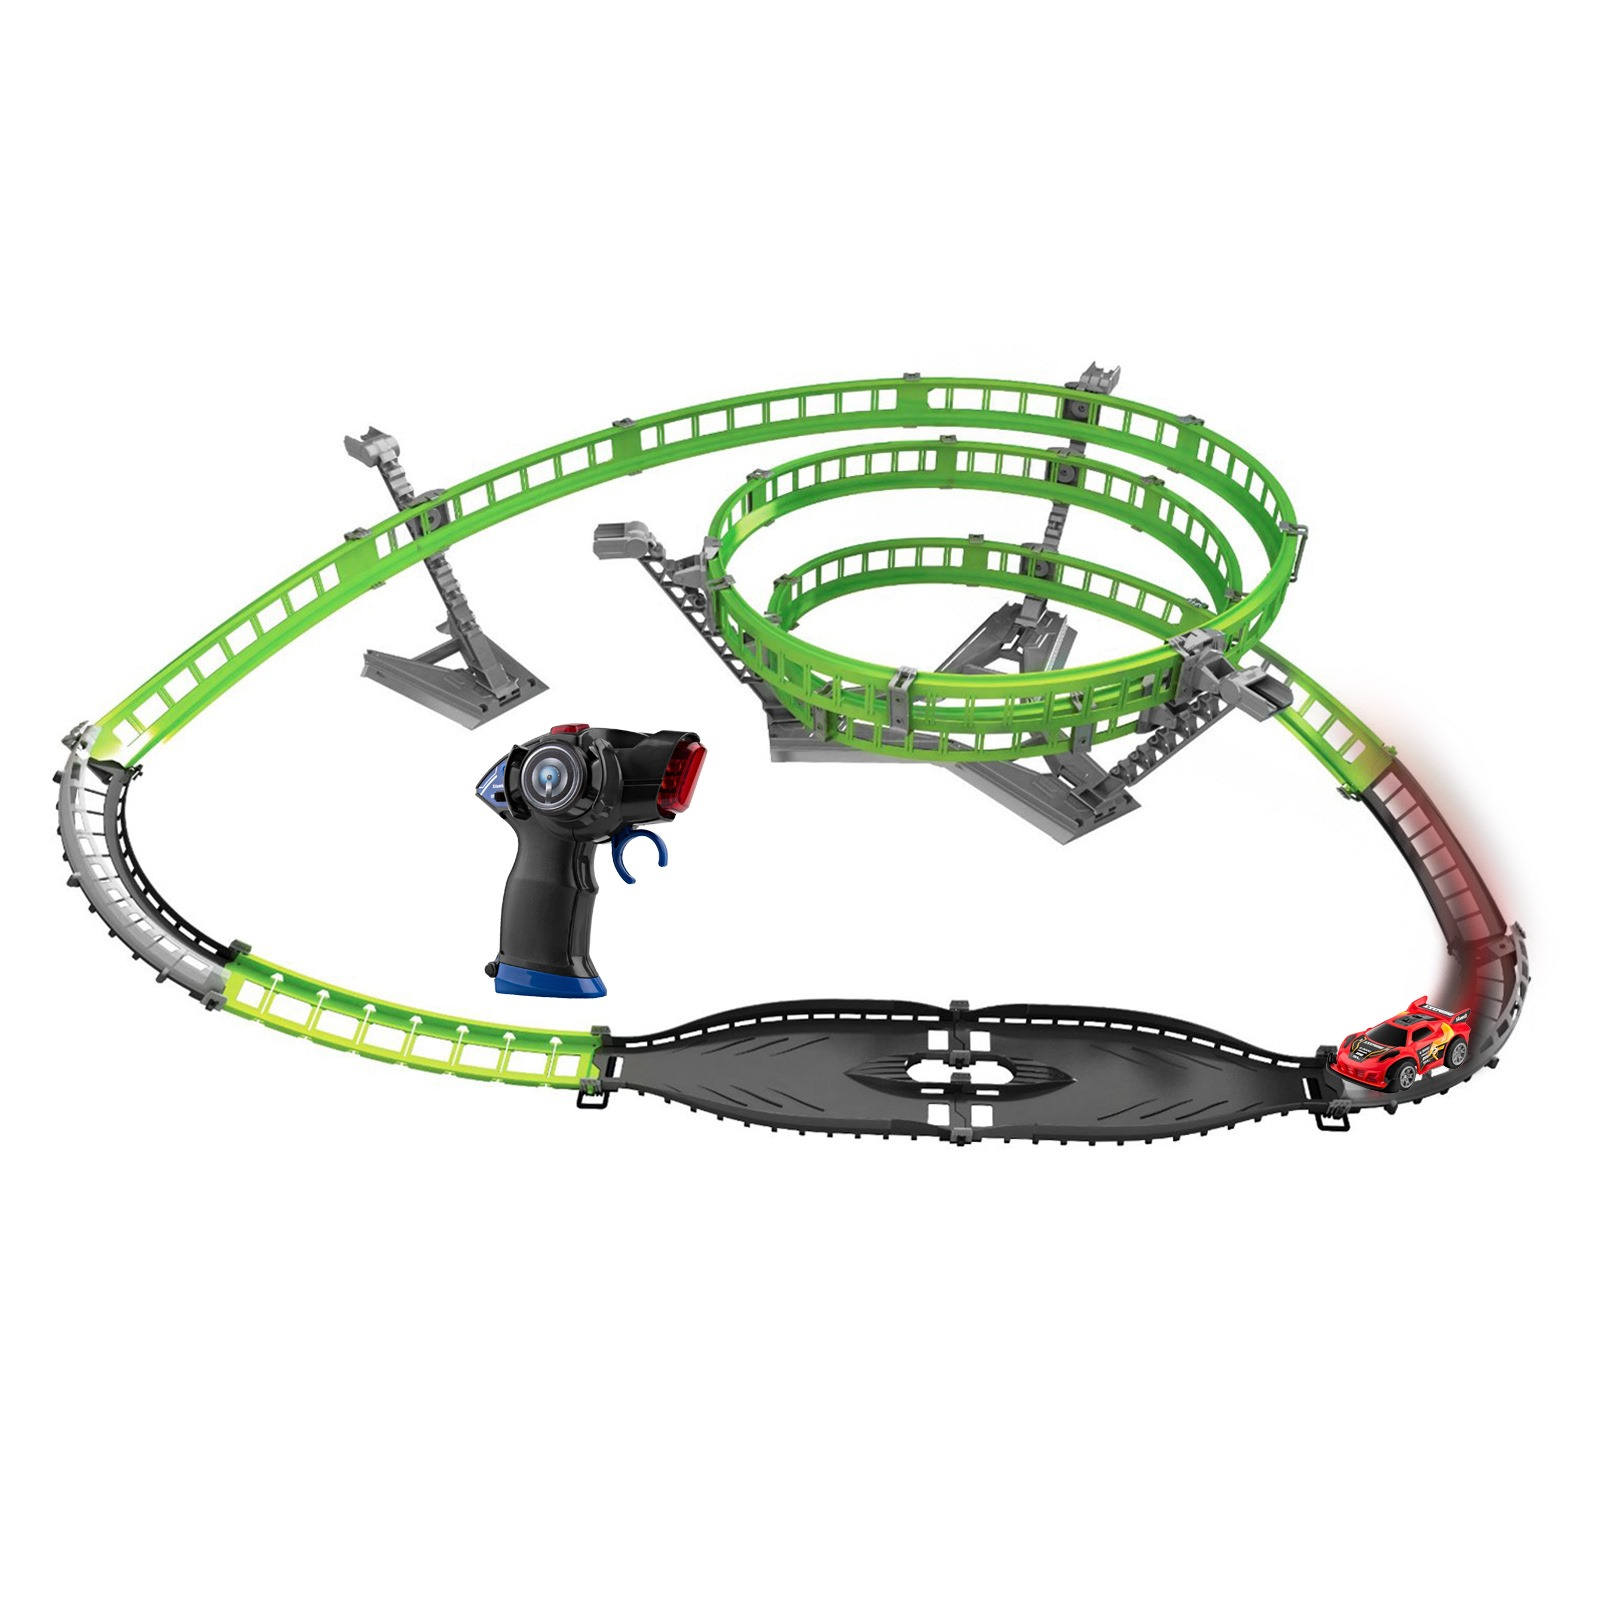 Silverlit 3D X-Trek Tornado Stunt Vehicle Playset (Green) SIL-630403823939-A1